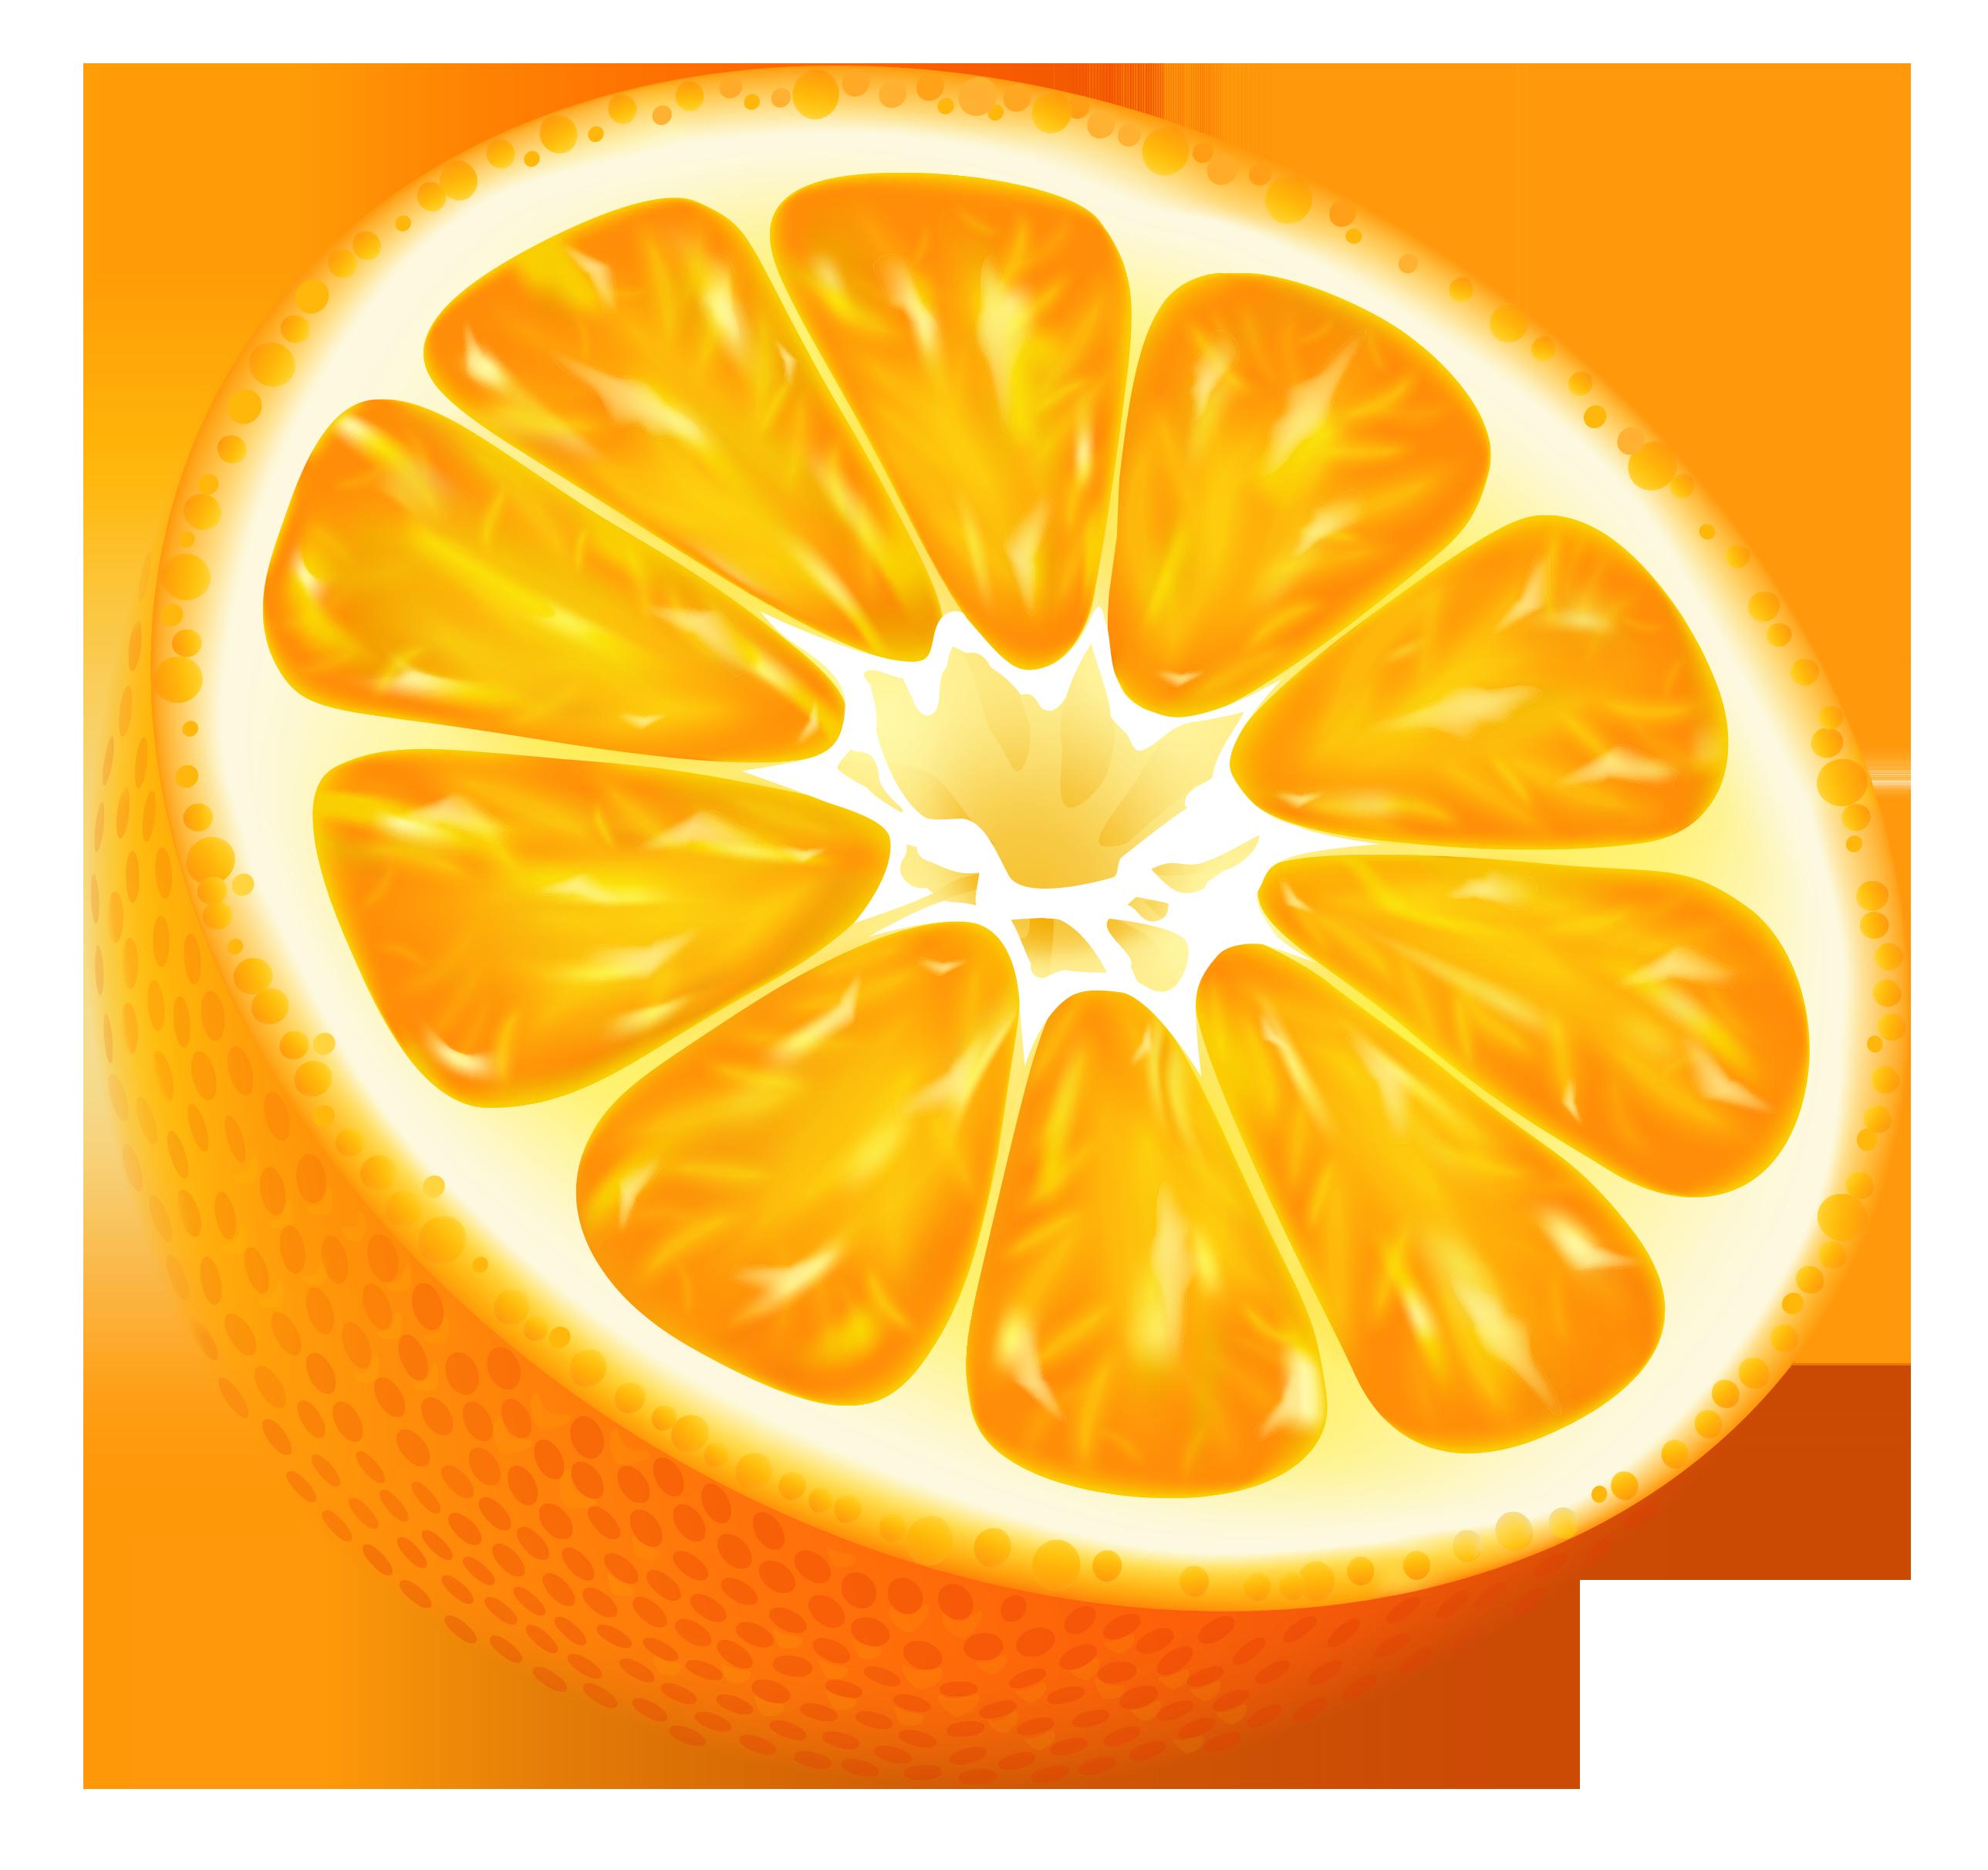 Half Orange Png Vector Clipart Image Frutas Imagens De Frutas Png